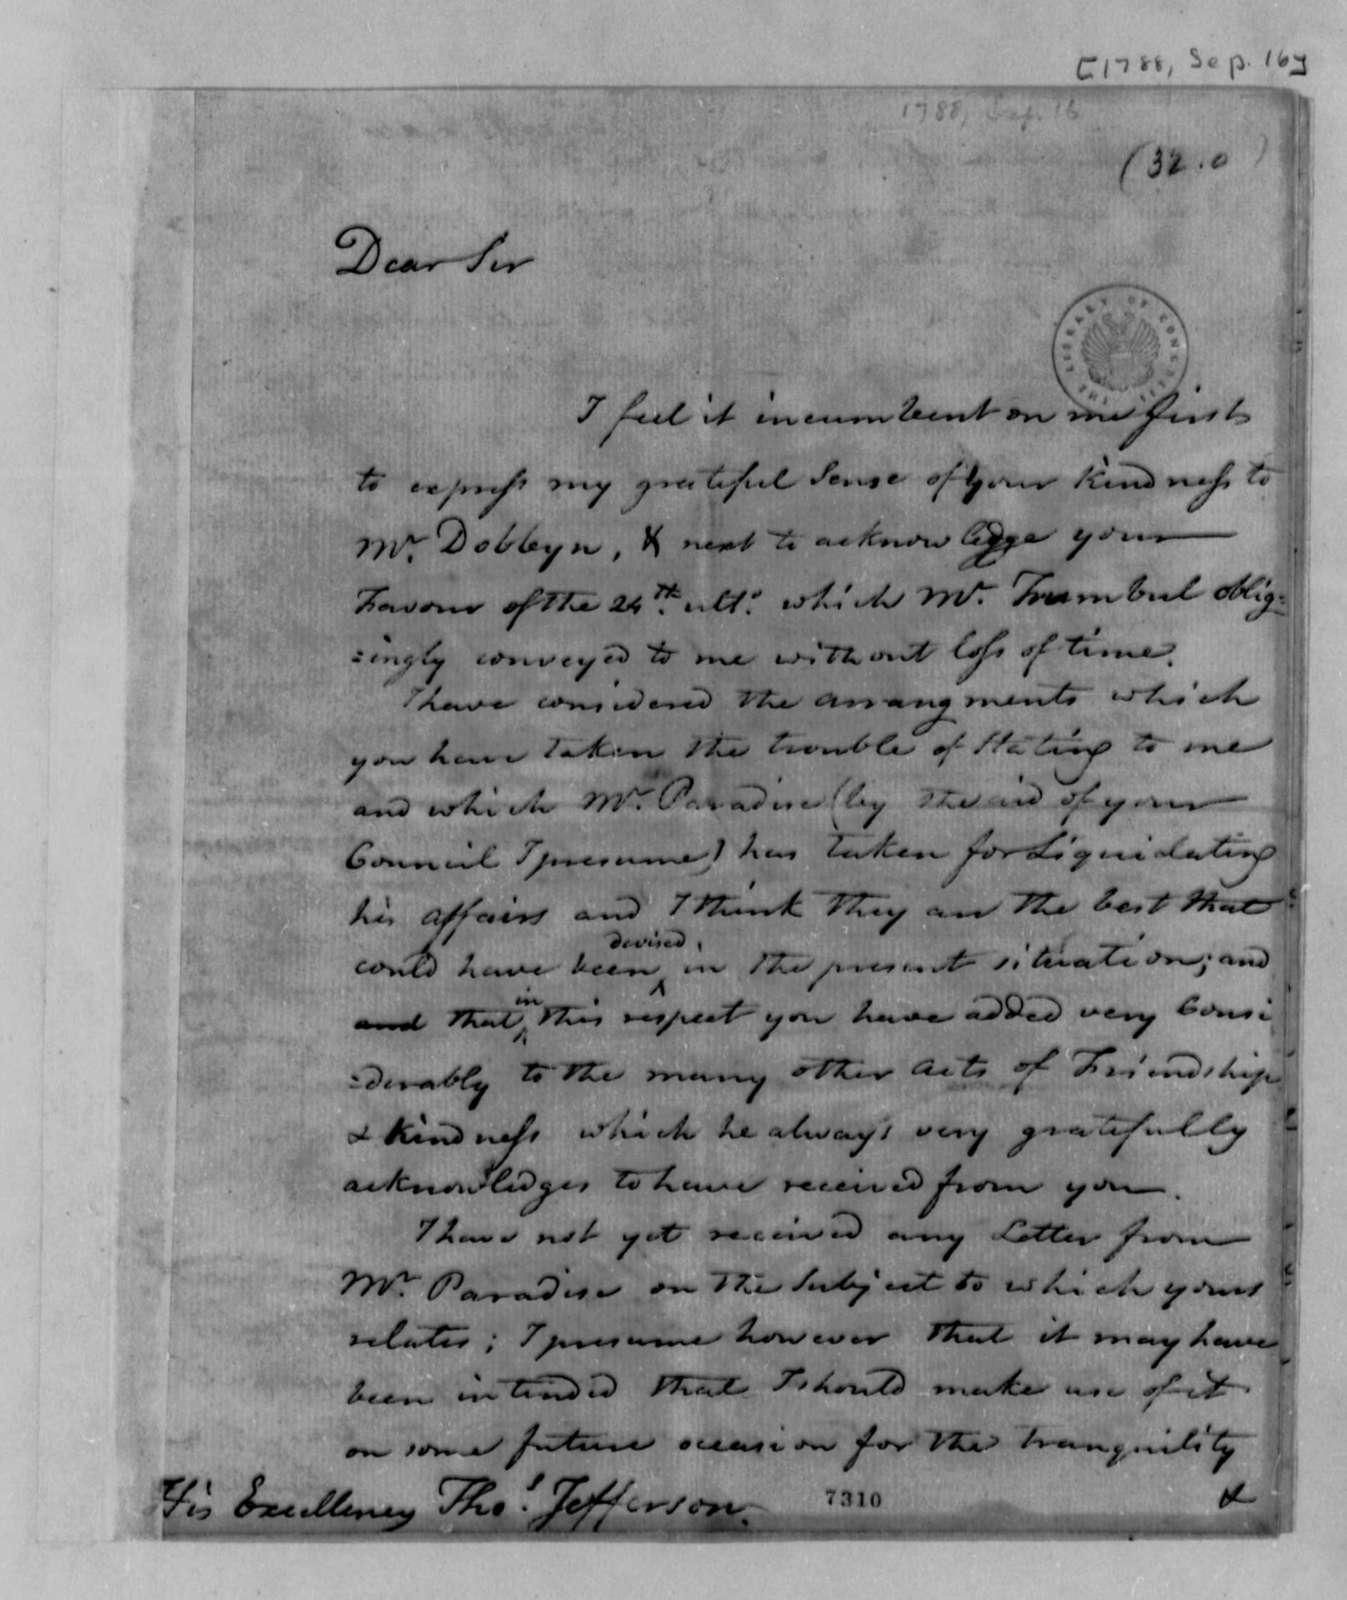 Edward Bancroft to Thomas Jefferson, September 16, 1788